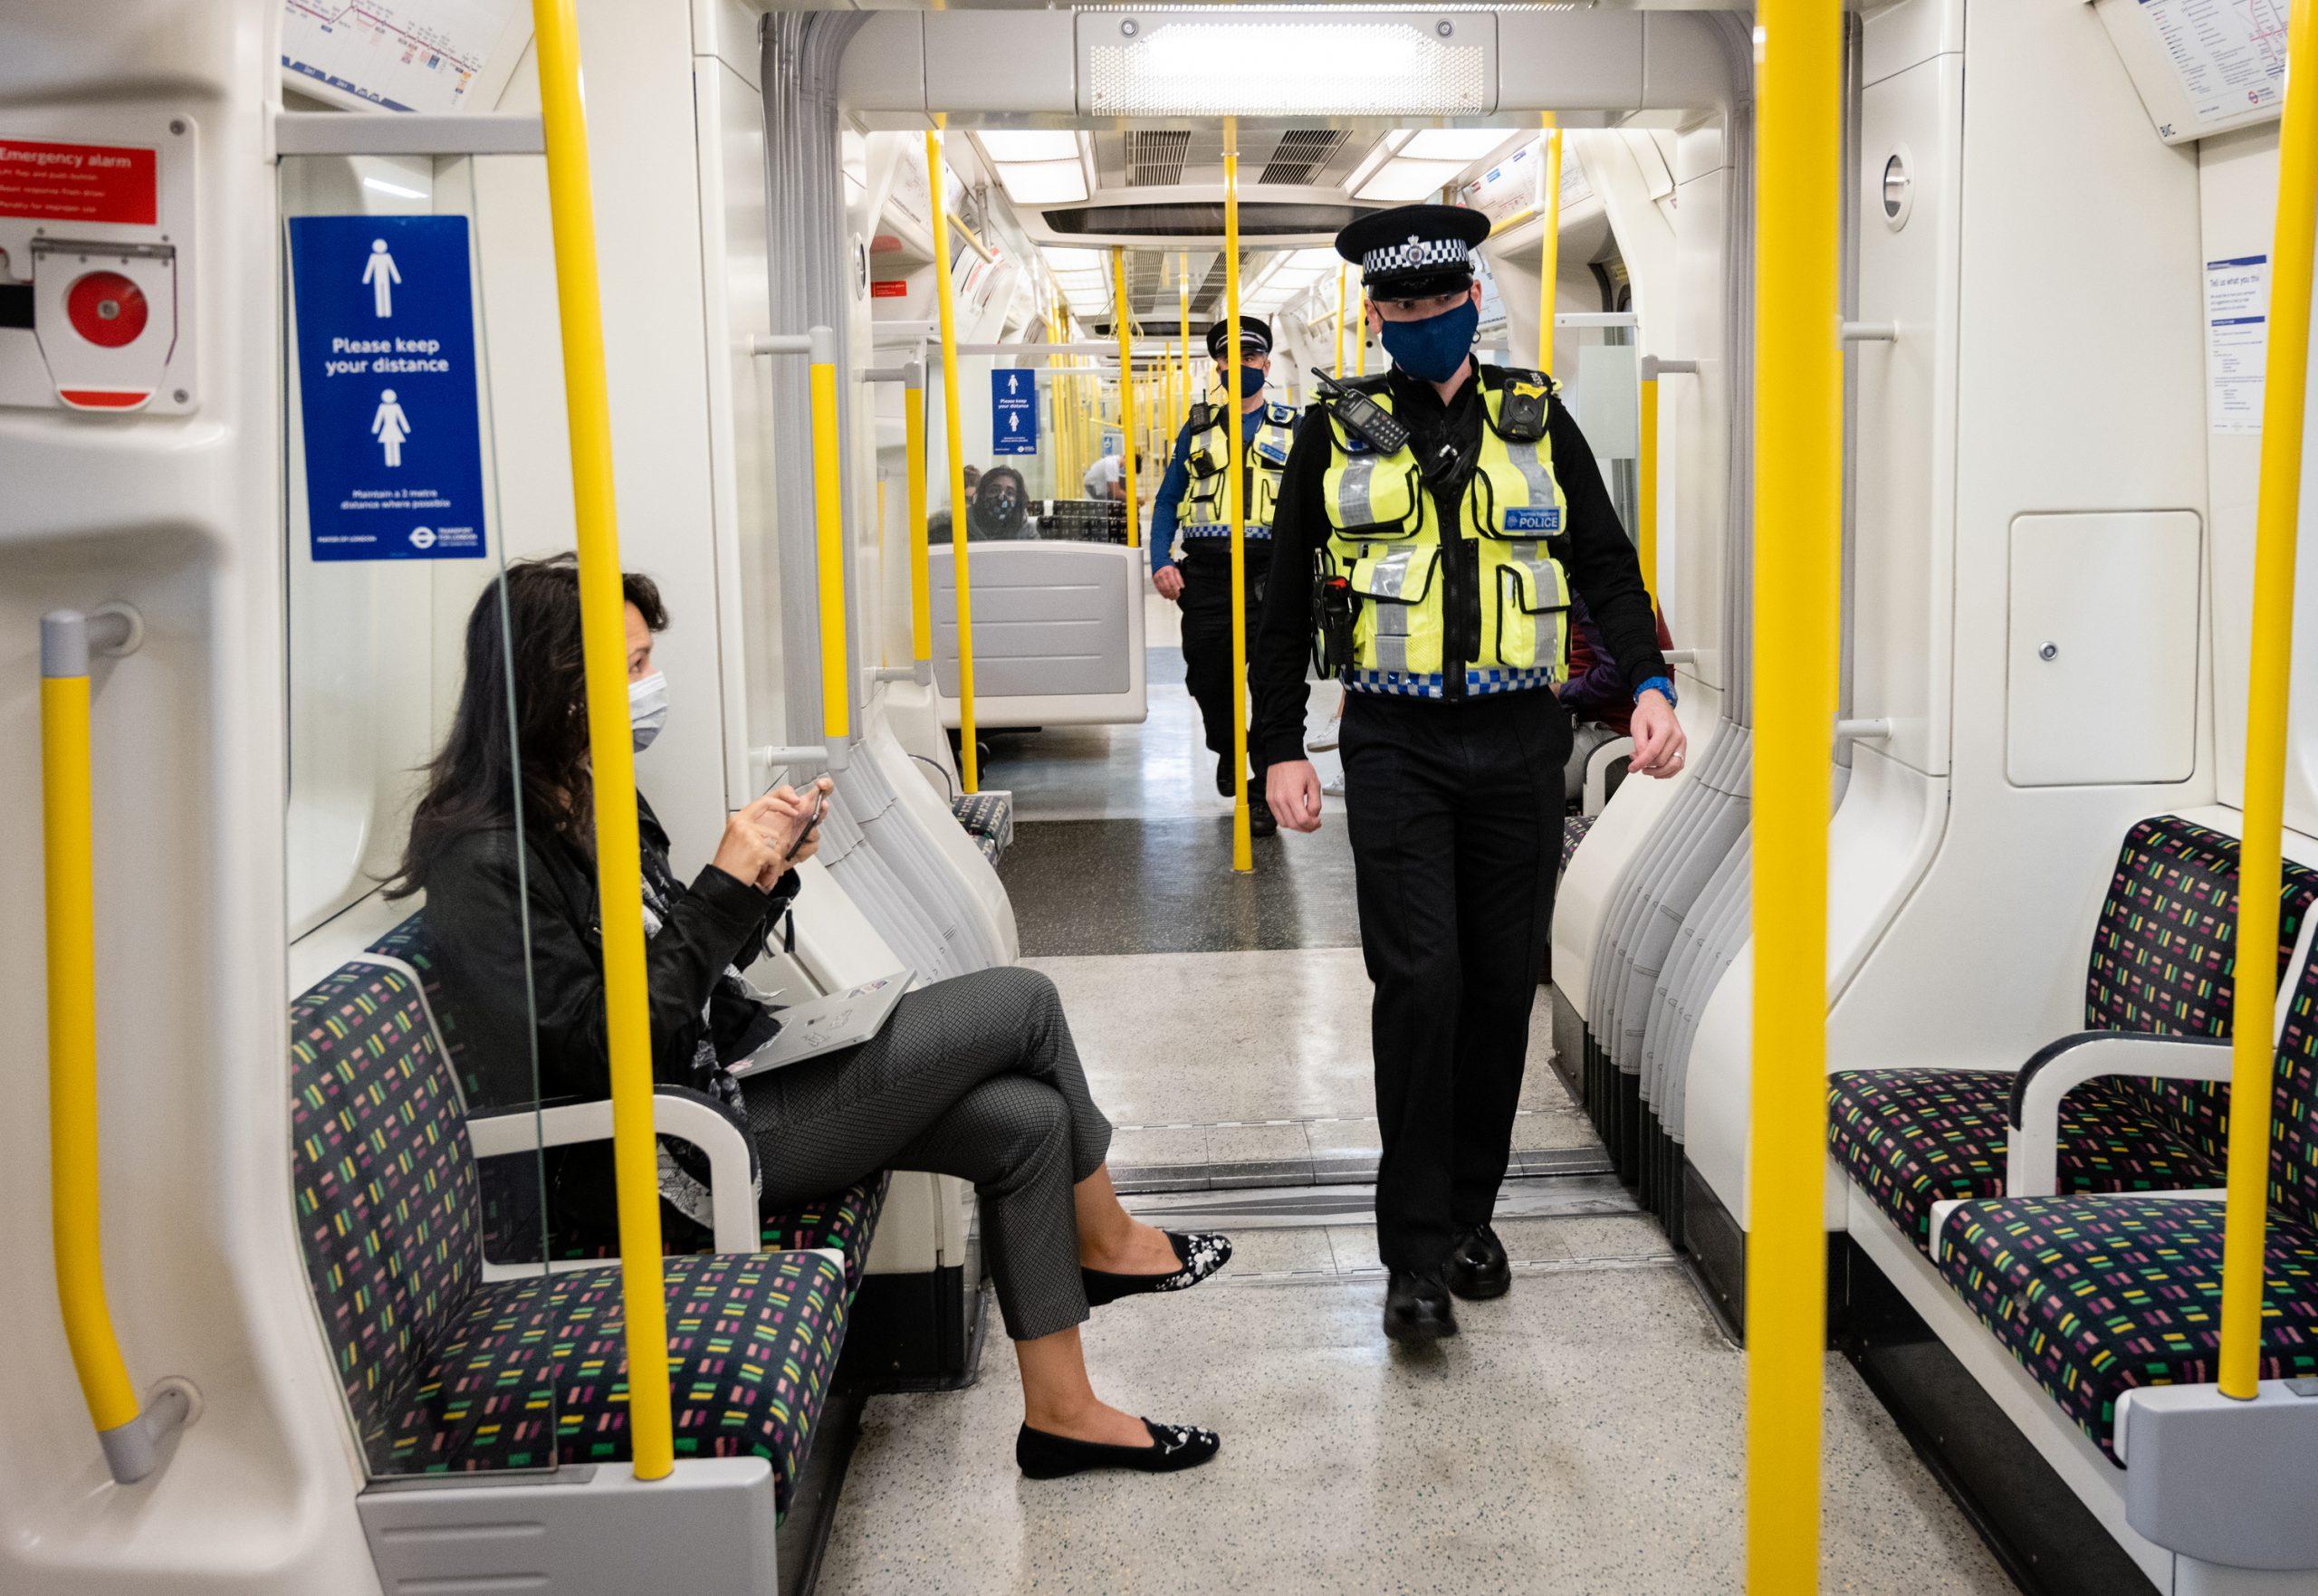 TfL face coverings enforcement on bus